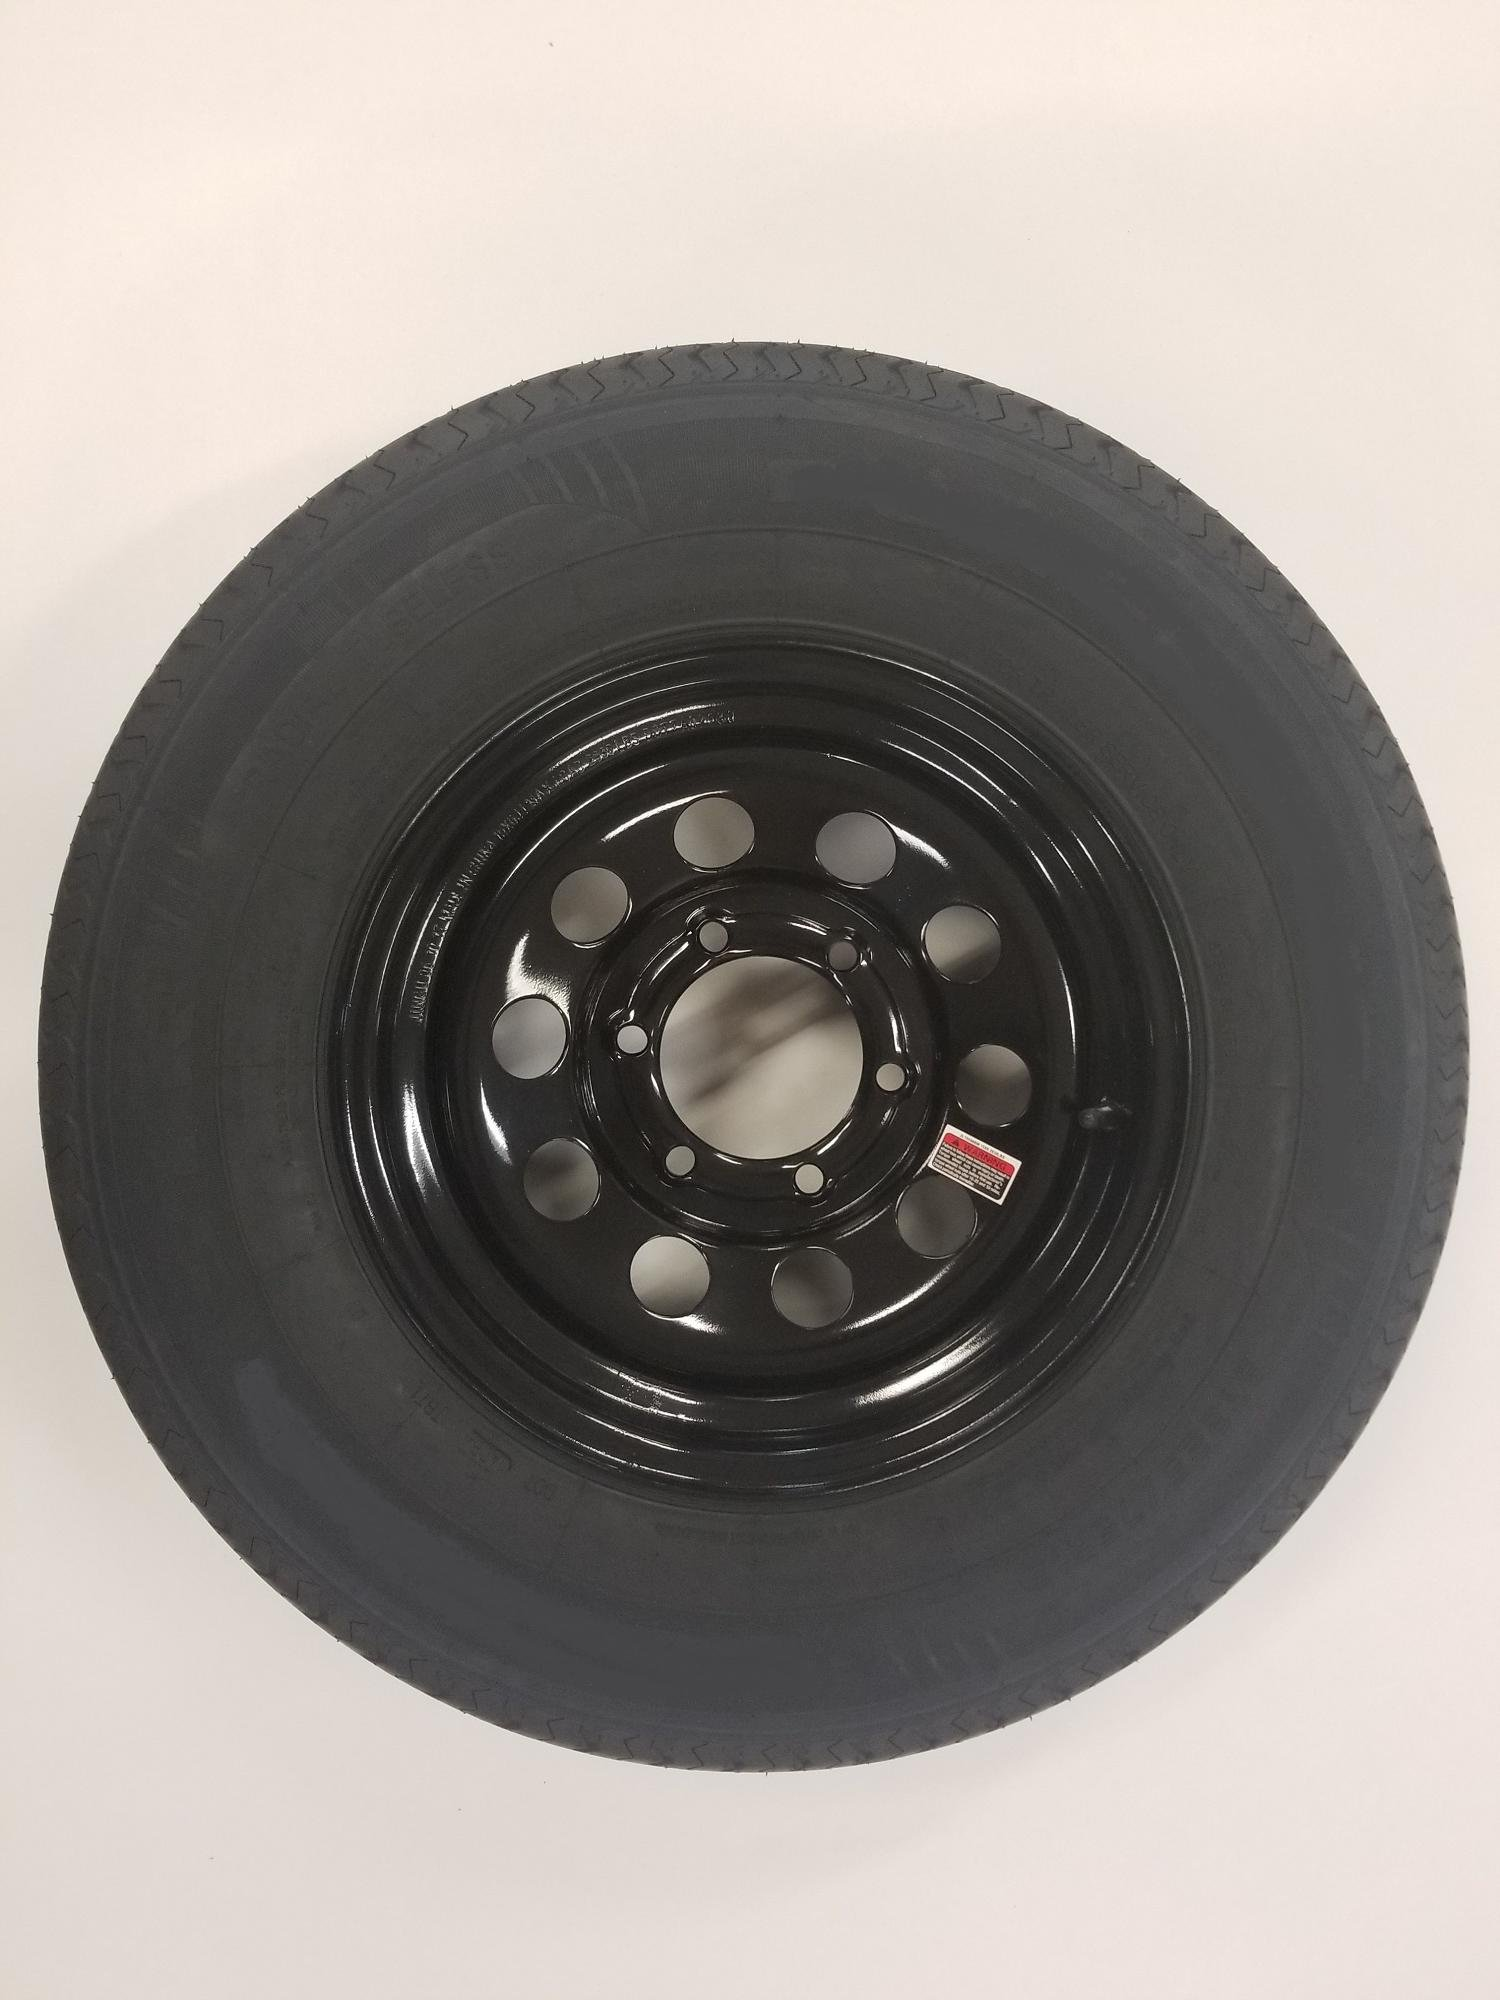 15'' Black Mod Trailer Wheel 6 Lug with Radial ST225/75R15 Tire Mounted (6x5.5) bolt circle